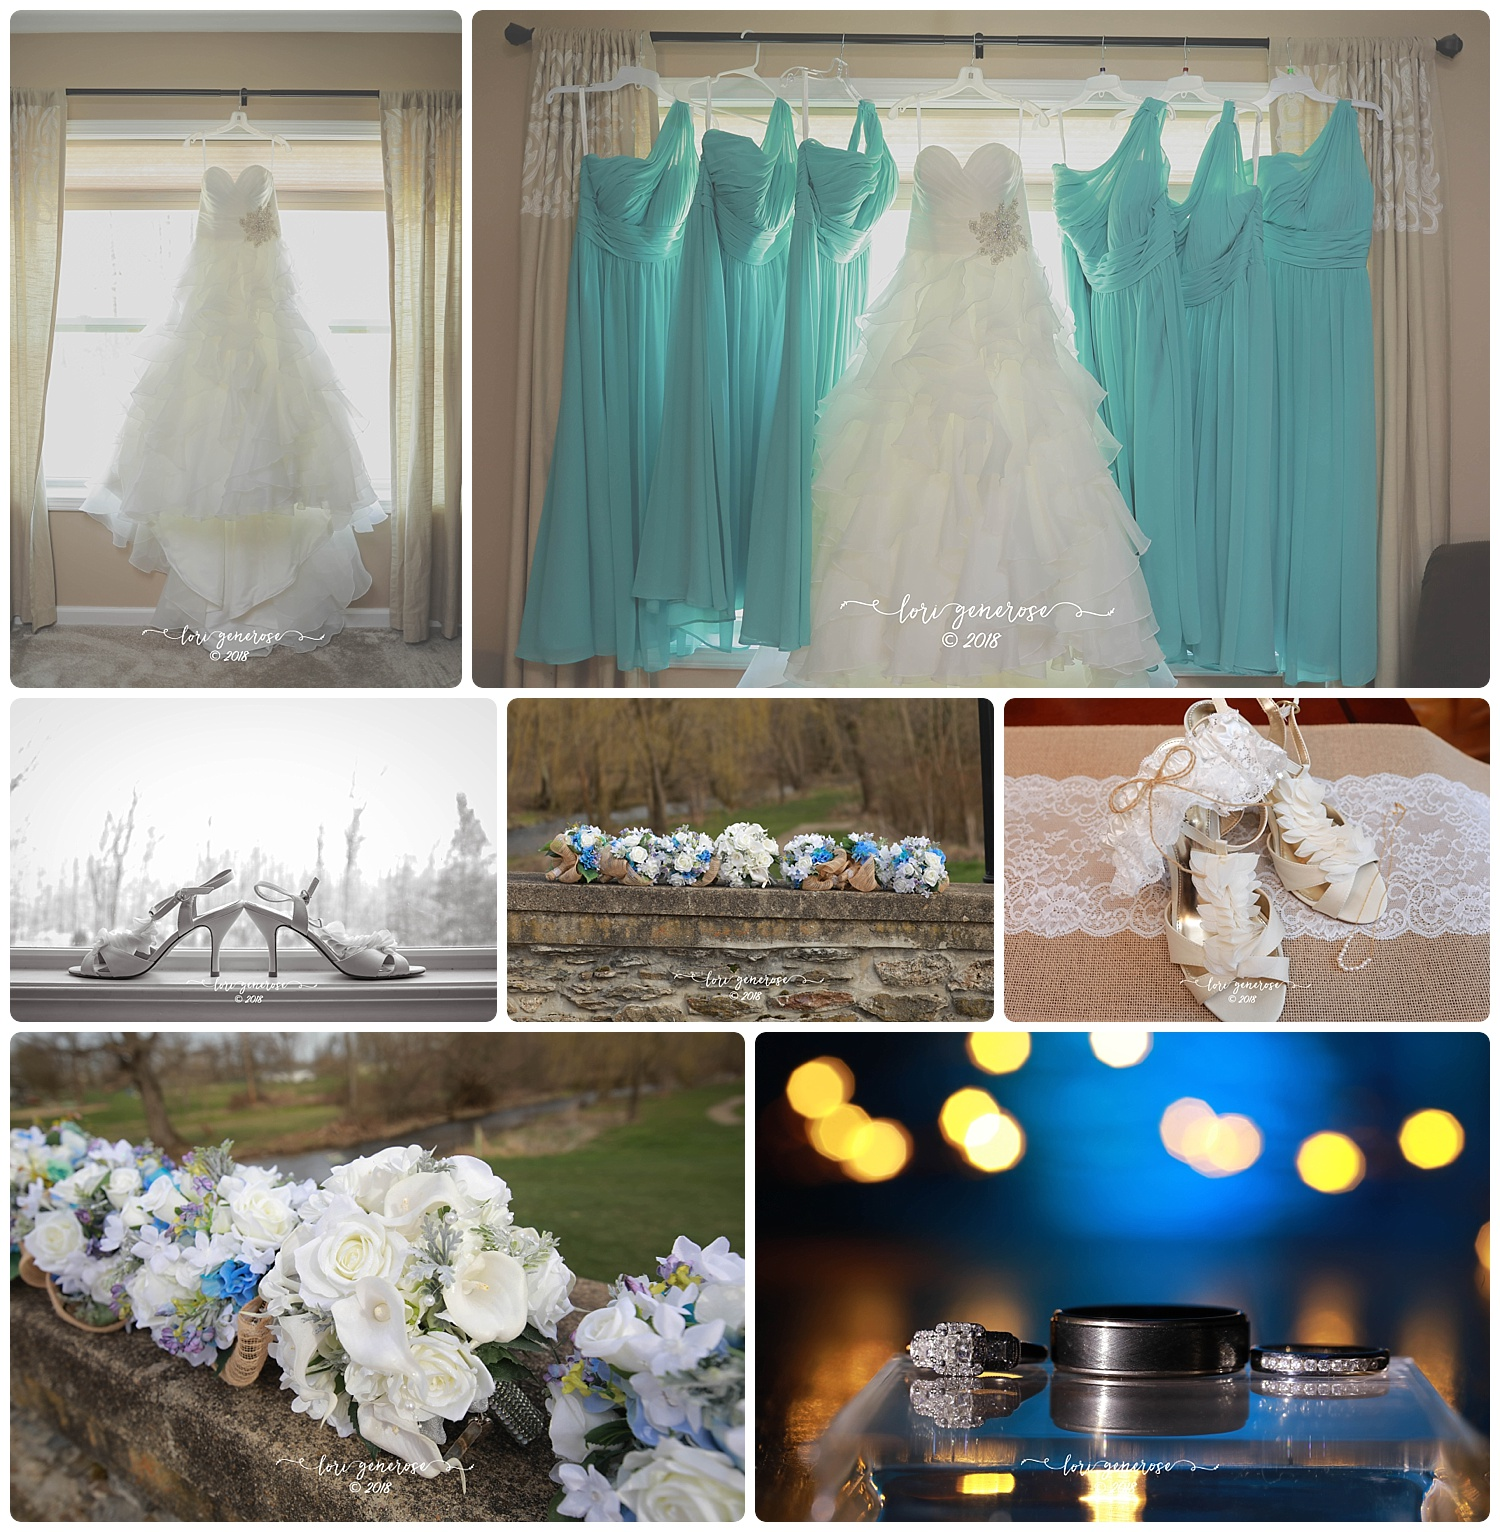 weddingdressdetailsflowersshoesringslgphotography.jpg